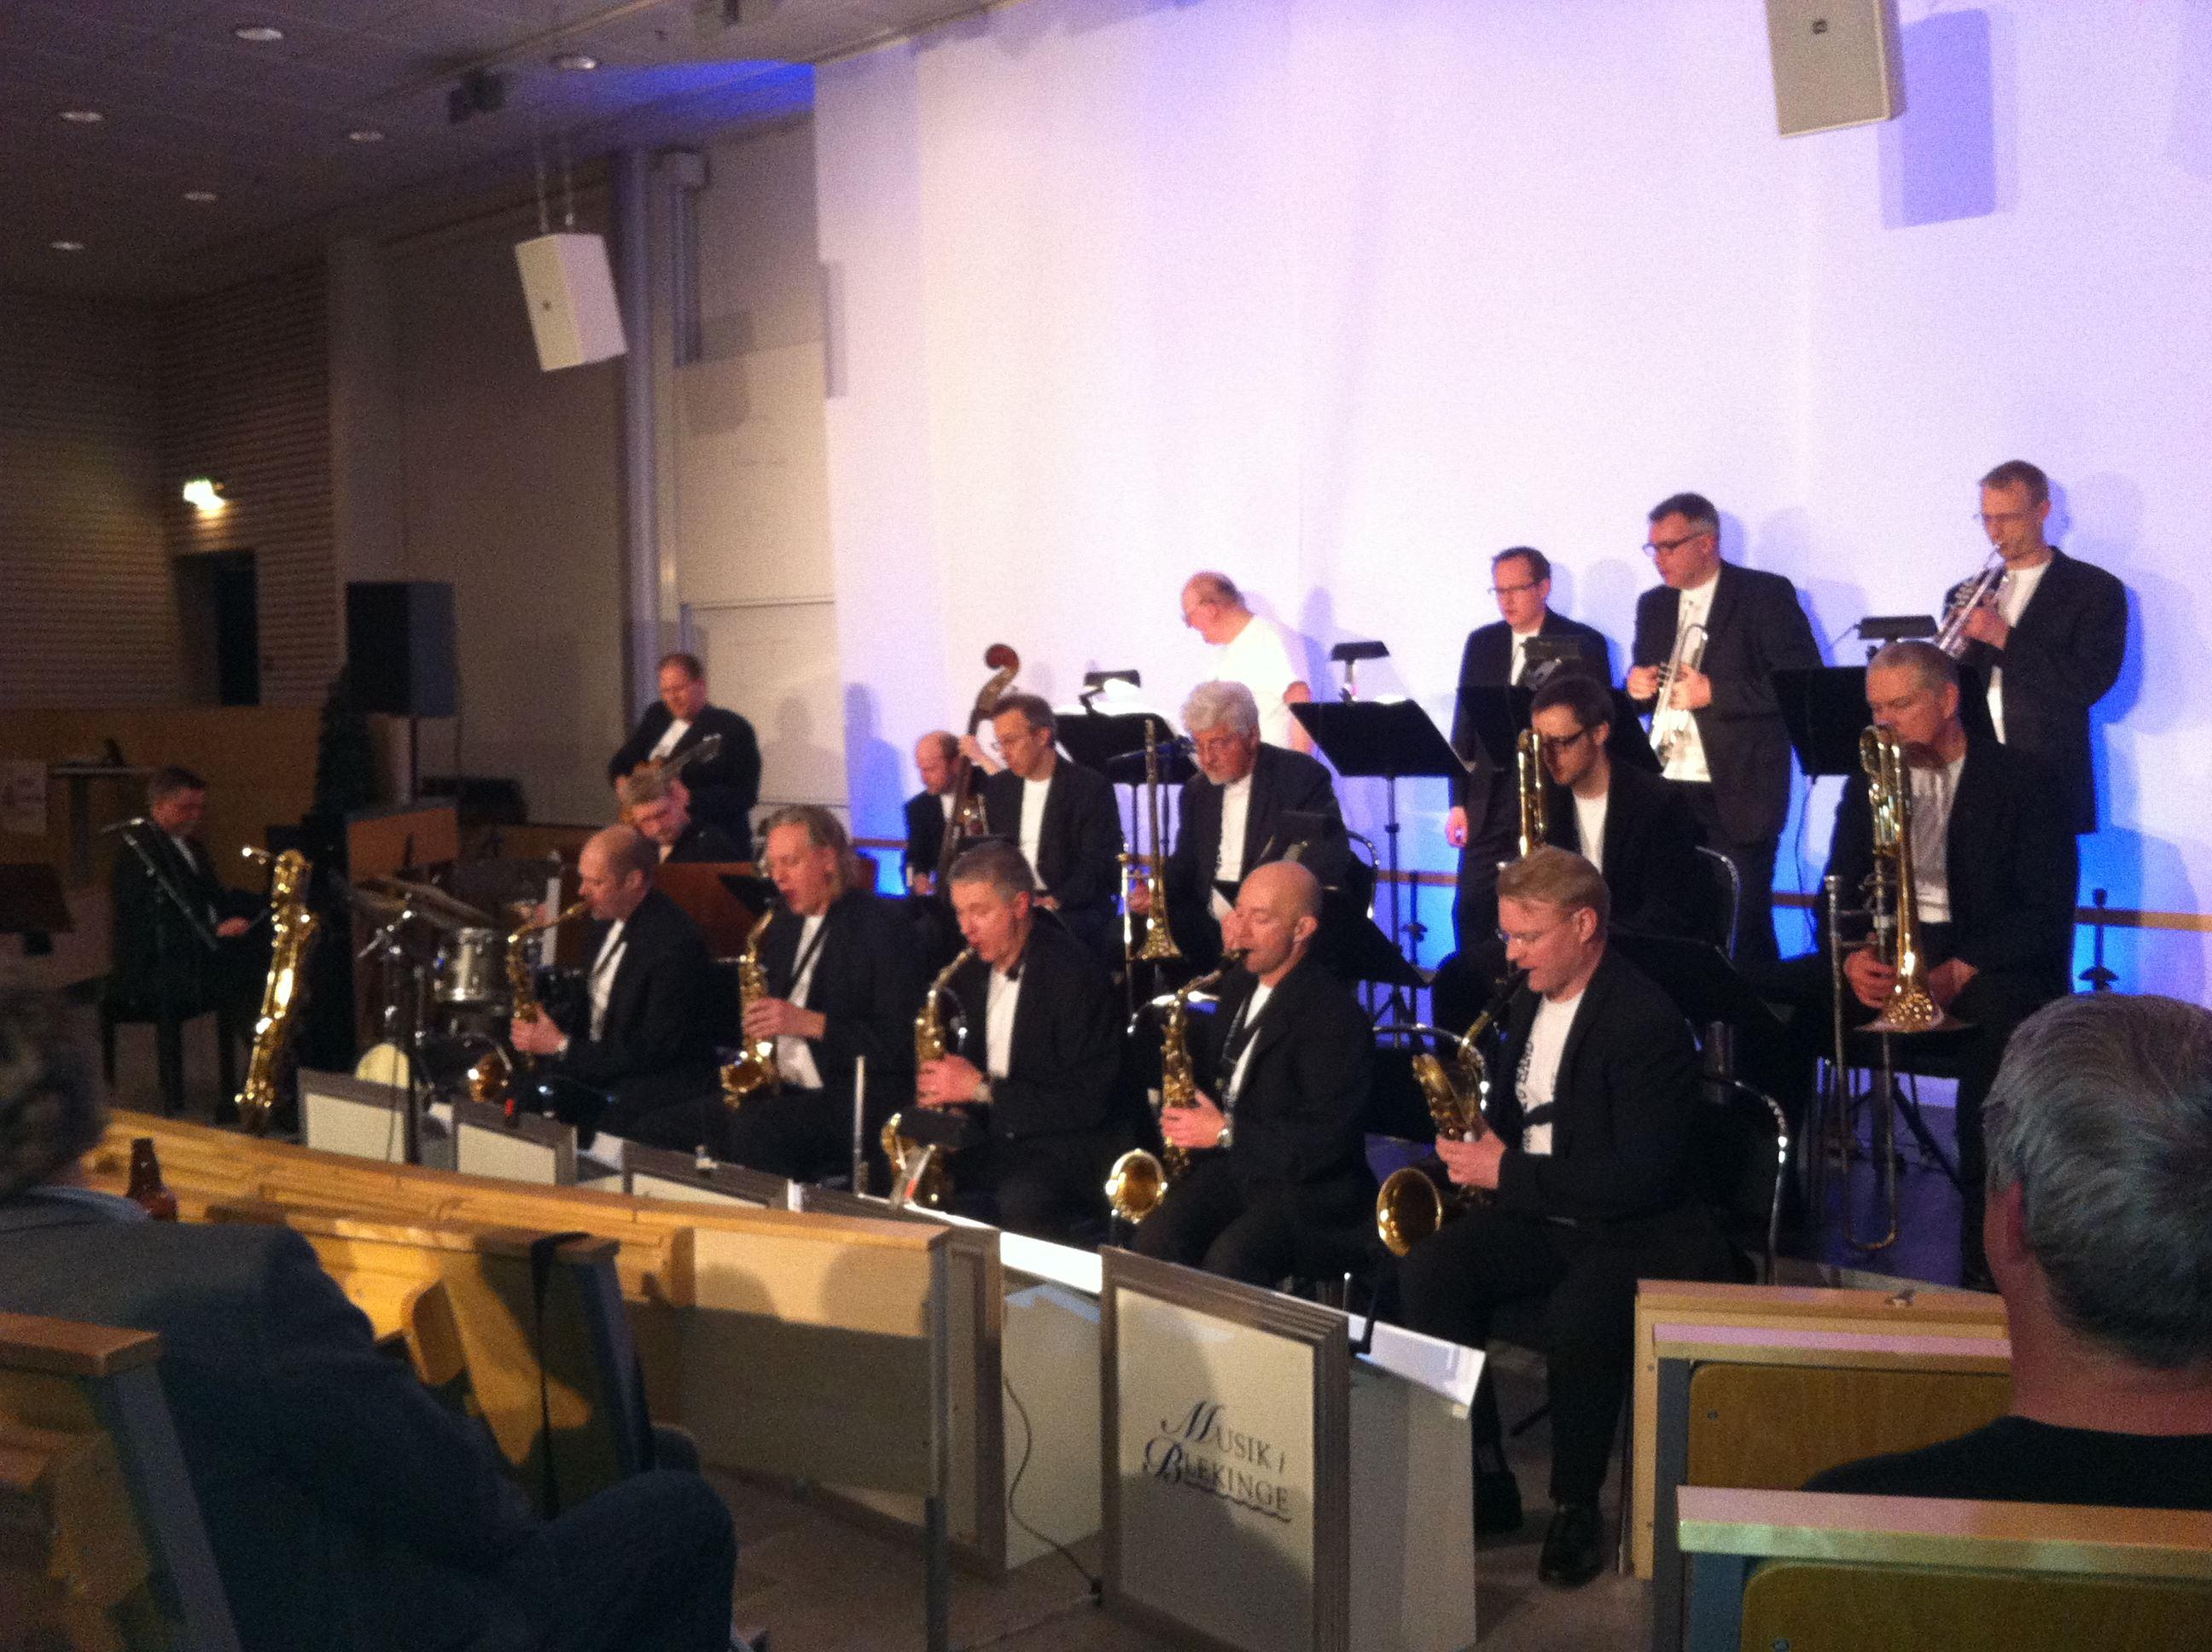 Blekinge Big Band with Katrine Madsen